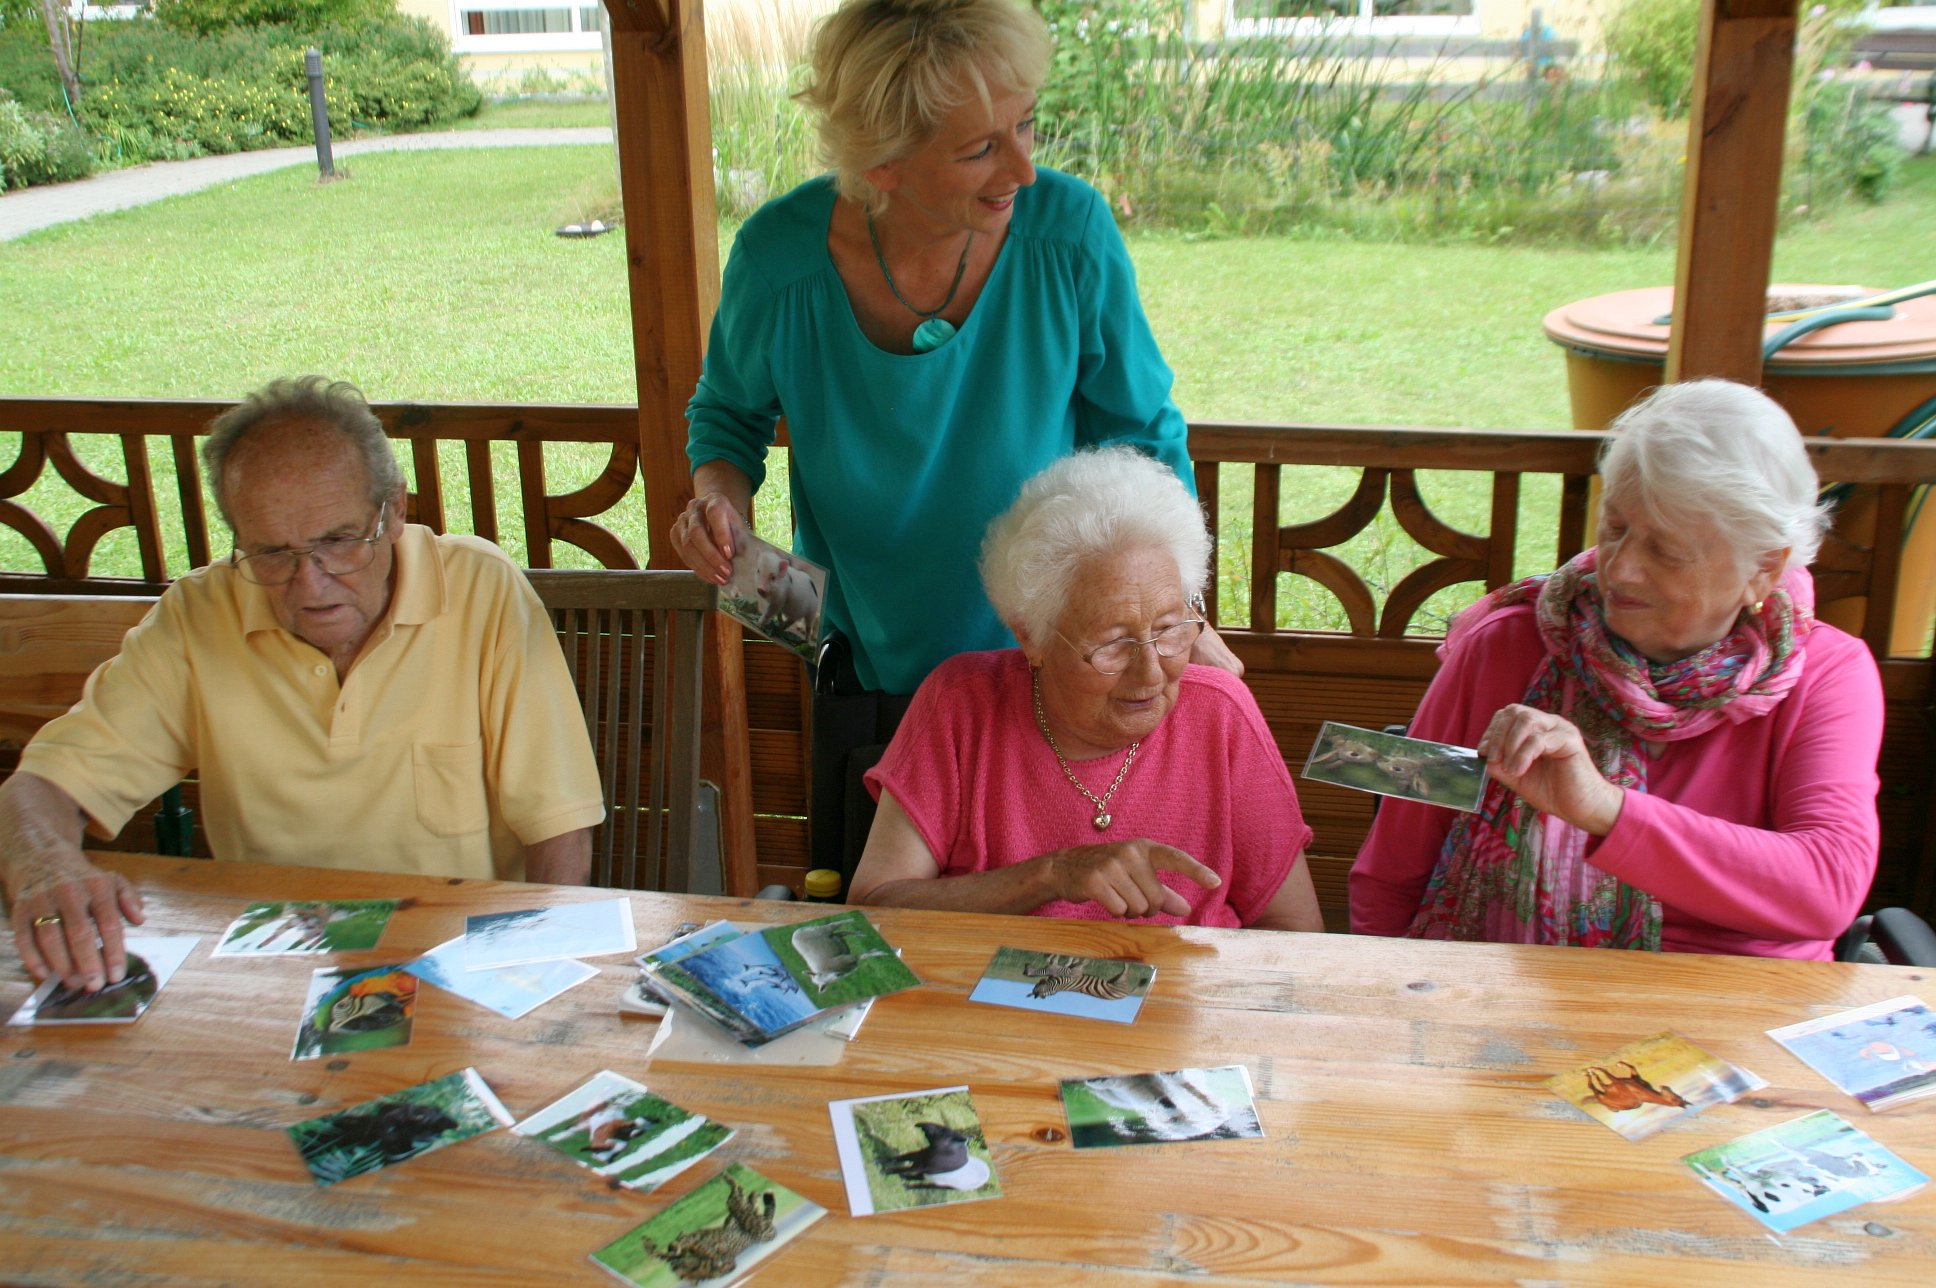 seniorenbetreuung-muenchen-lebensfreude-66-plus-demenzpraevention